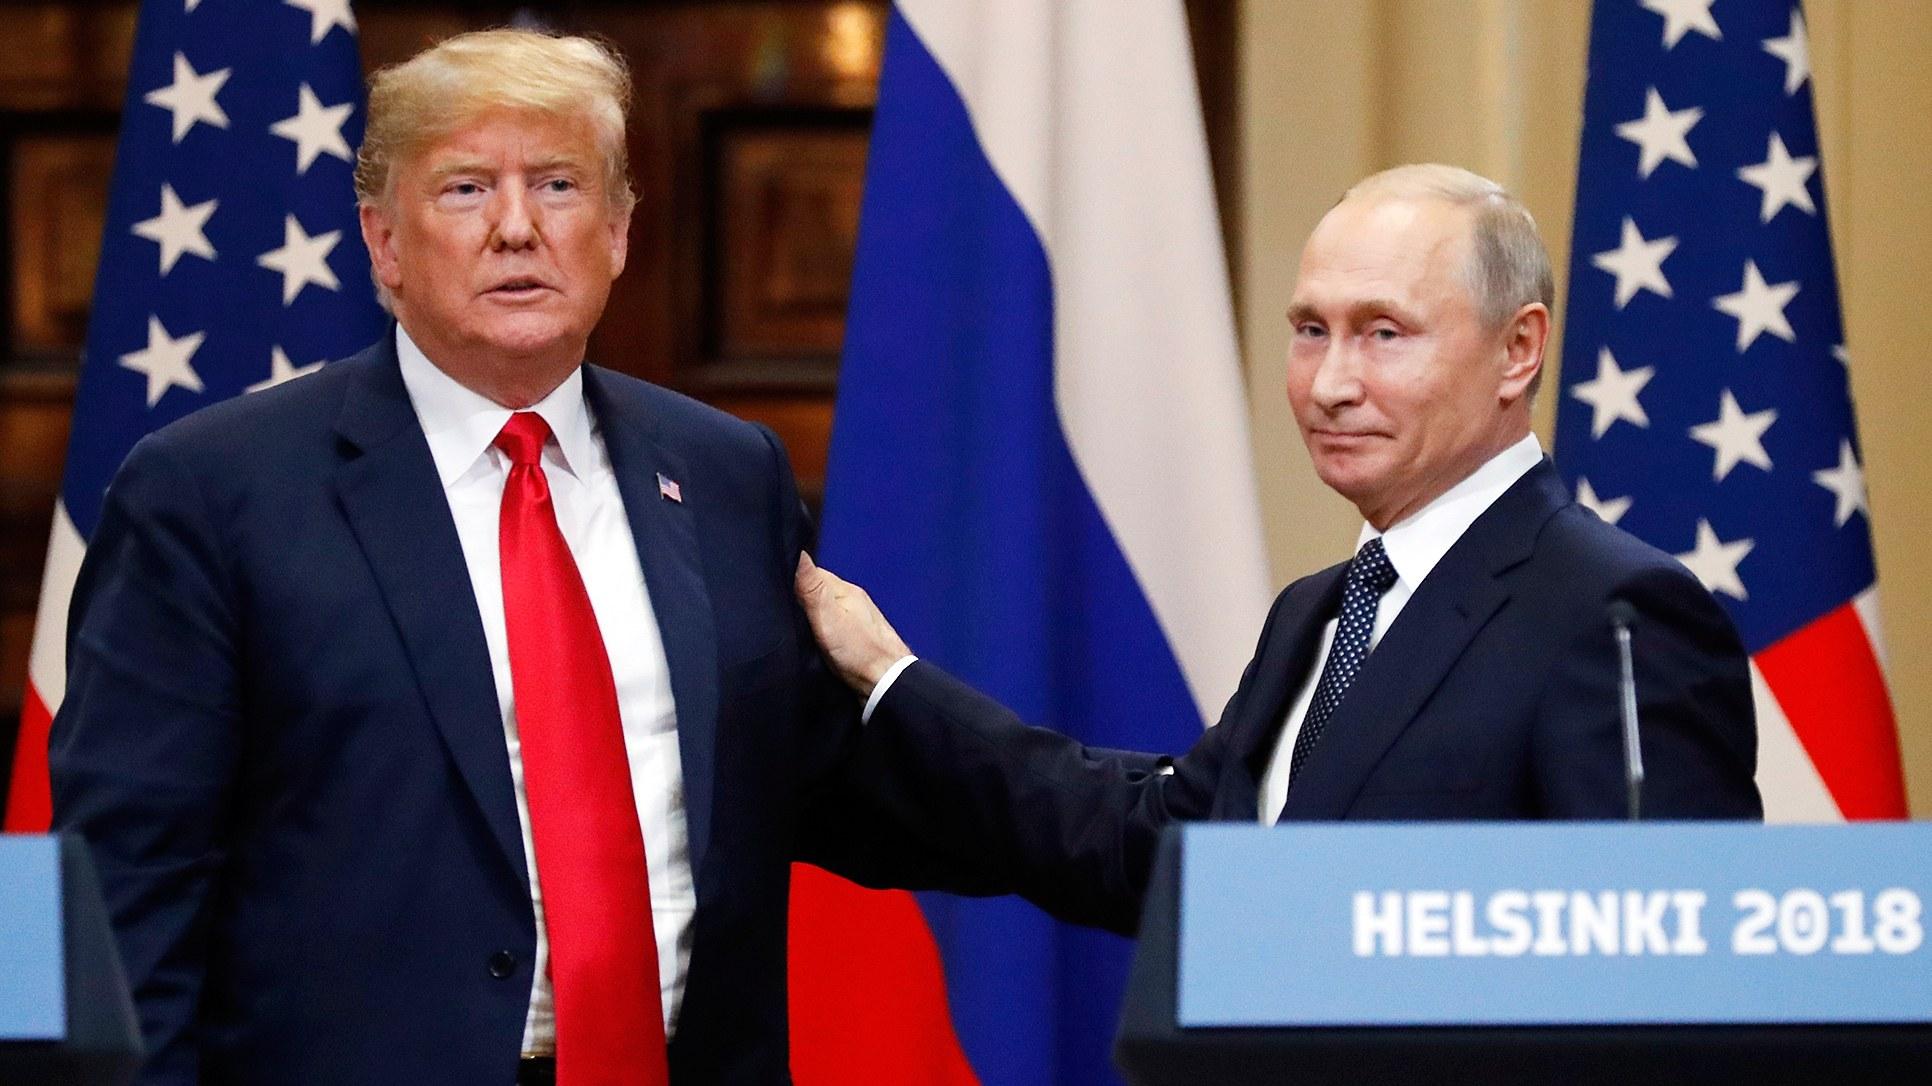 28 – News Rundown: Putin and Trump, Papa Johns CEO out, and a $3.9B Plane